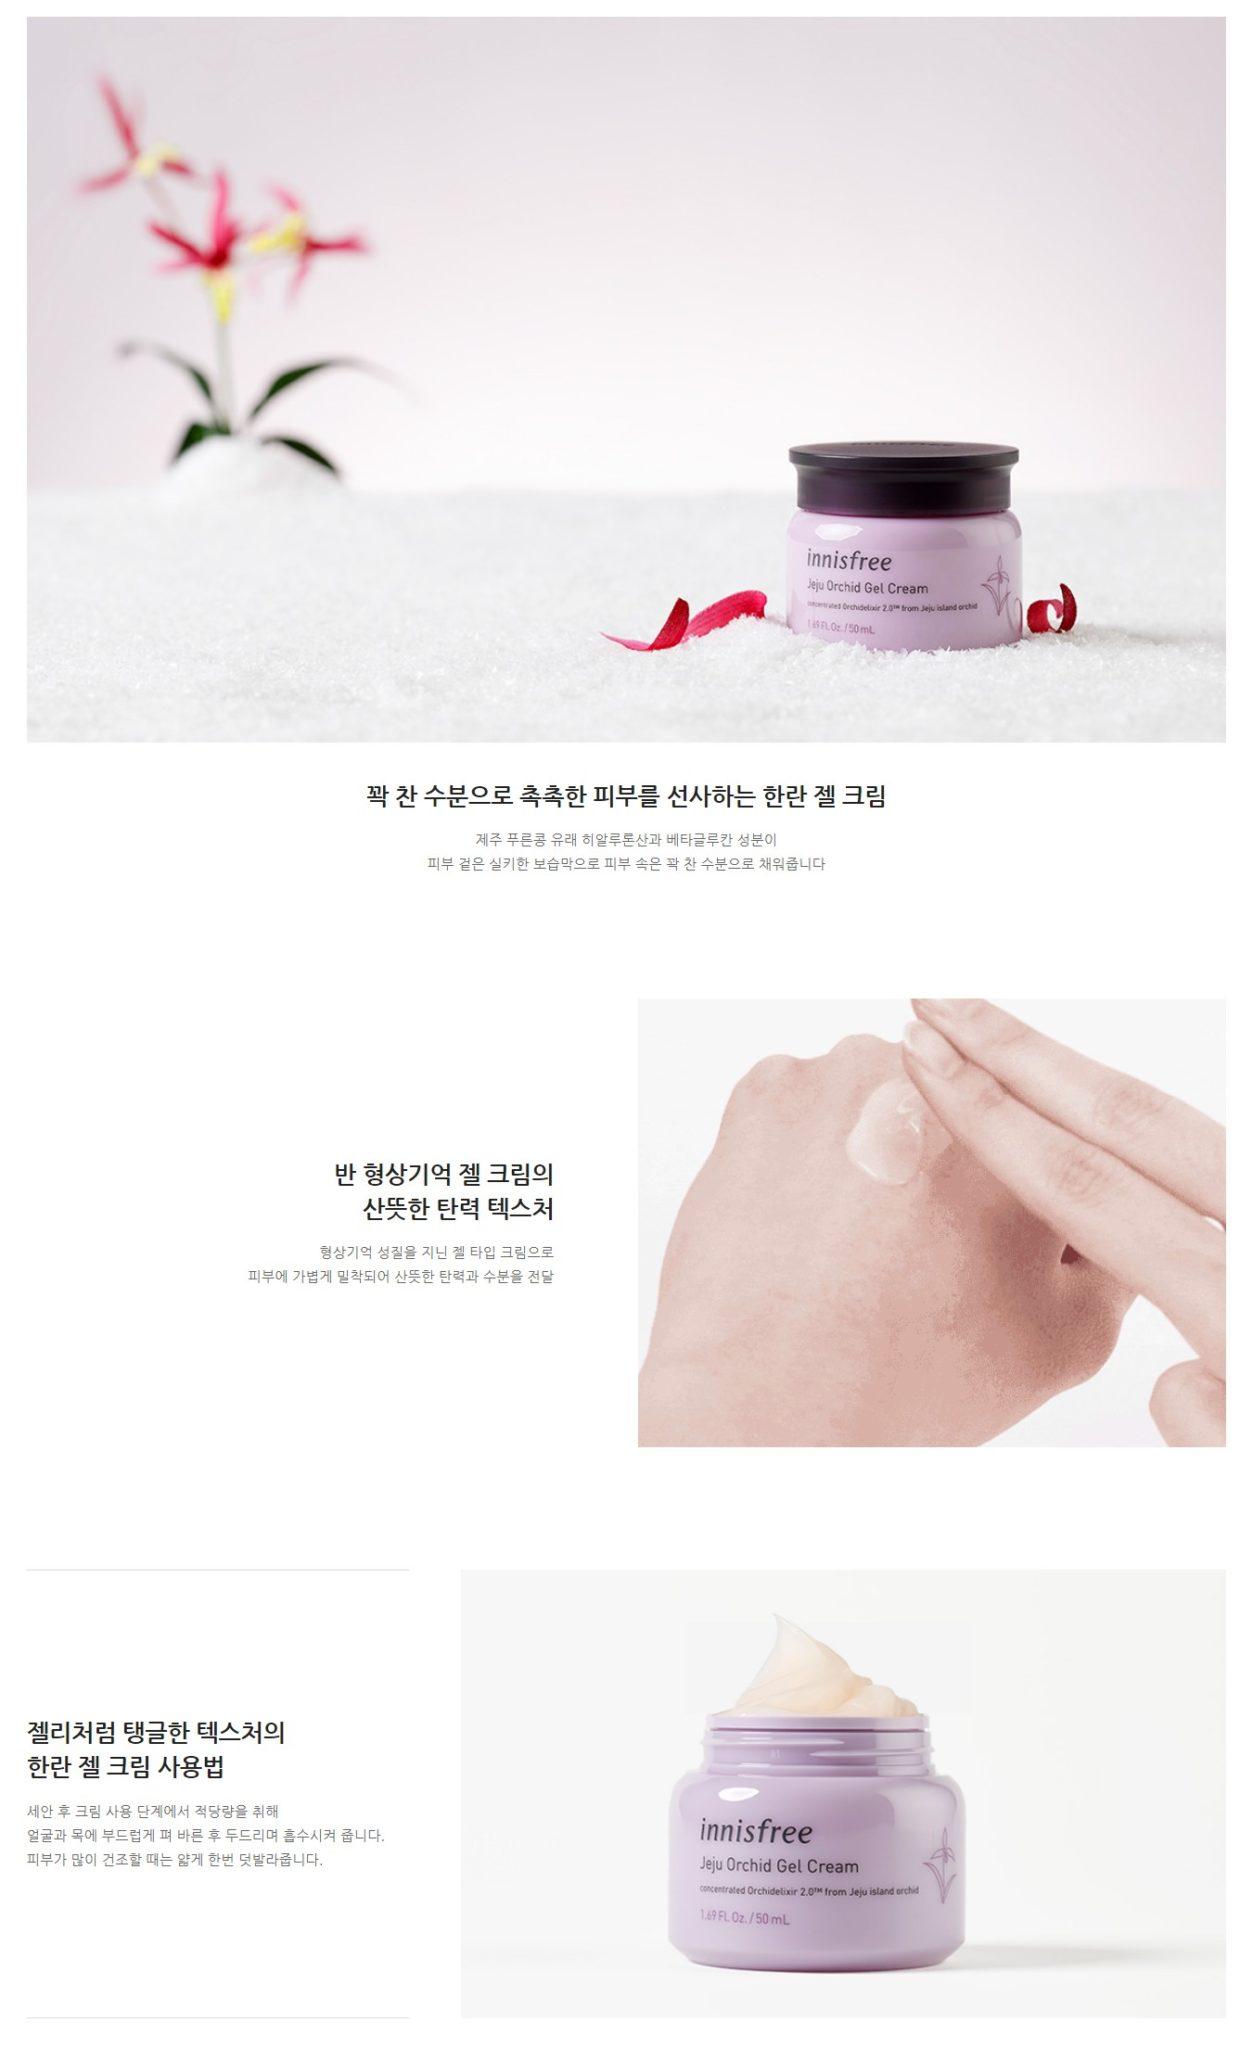 Innisfree Jeju Orchid Gel Cream